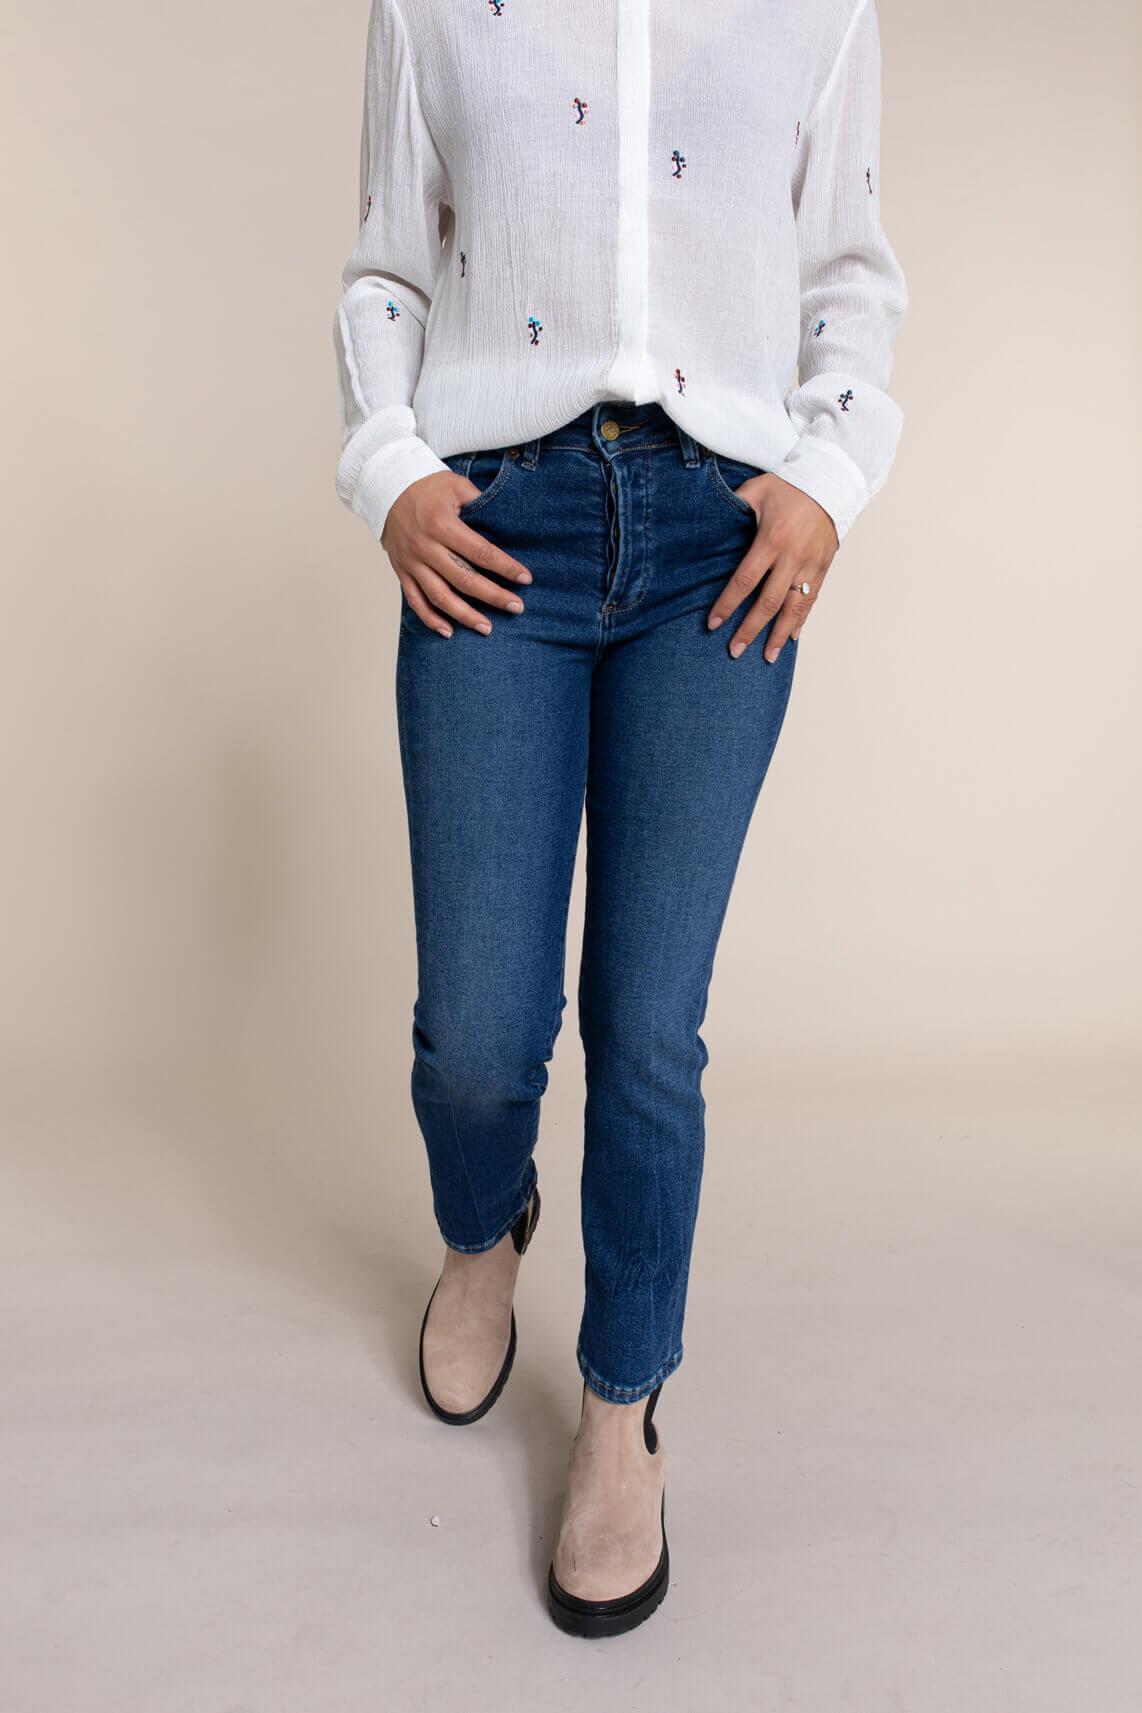 Lois Dames Riko jeans Blauw